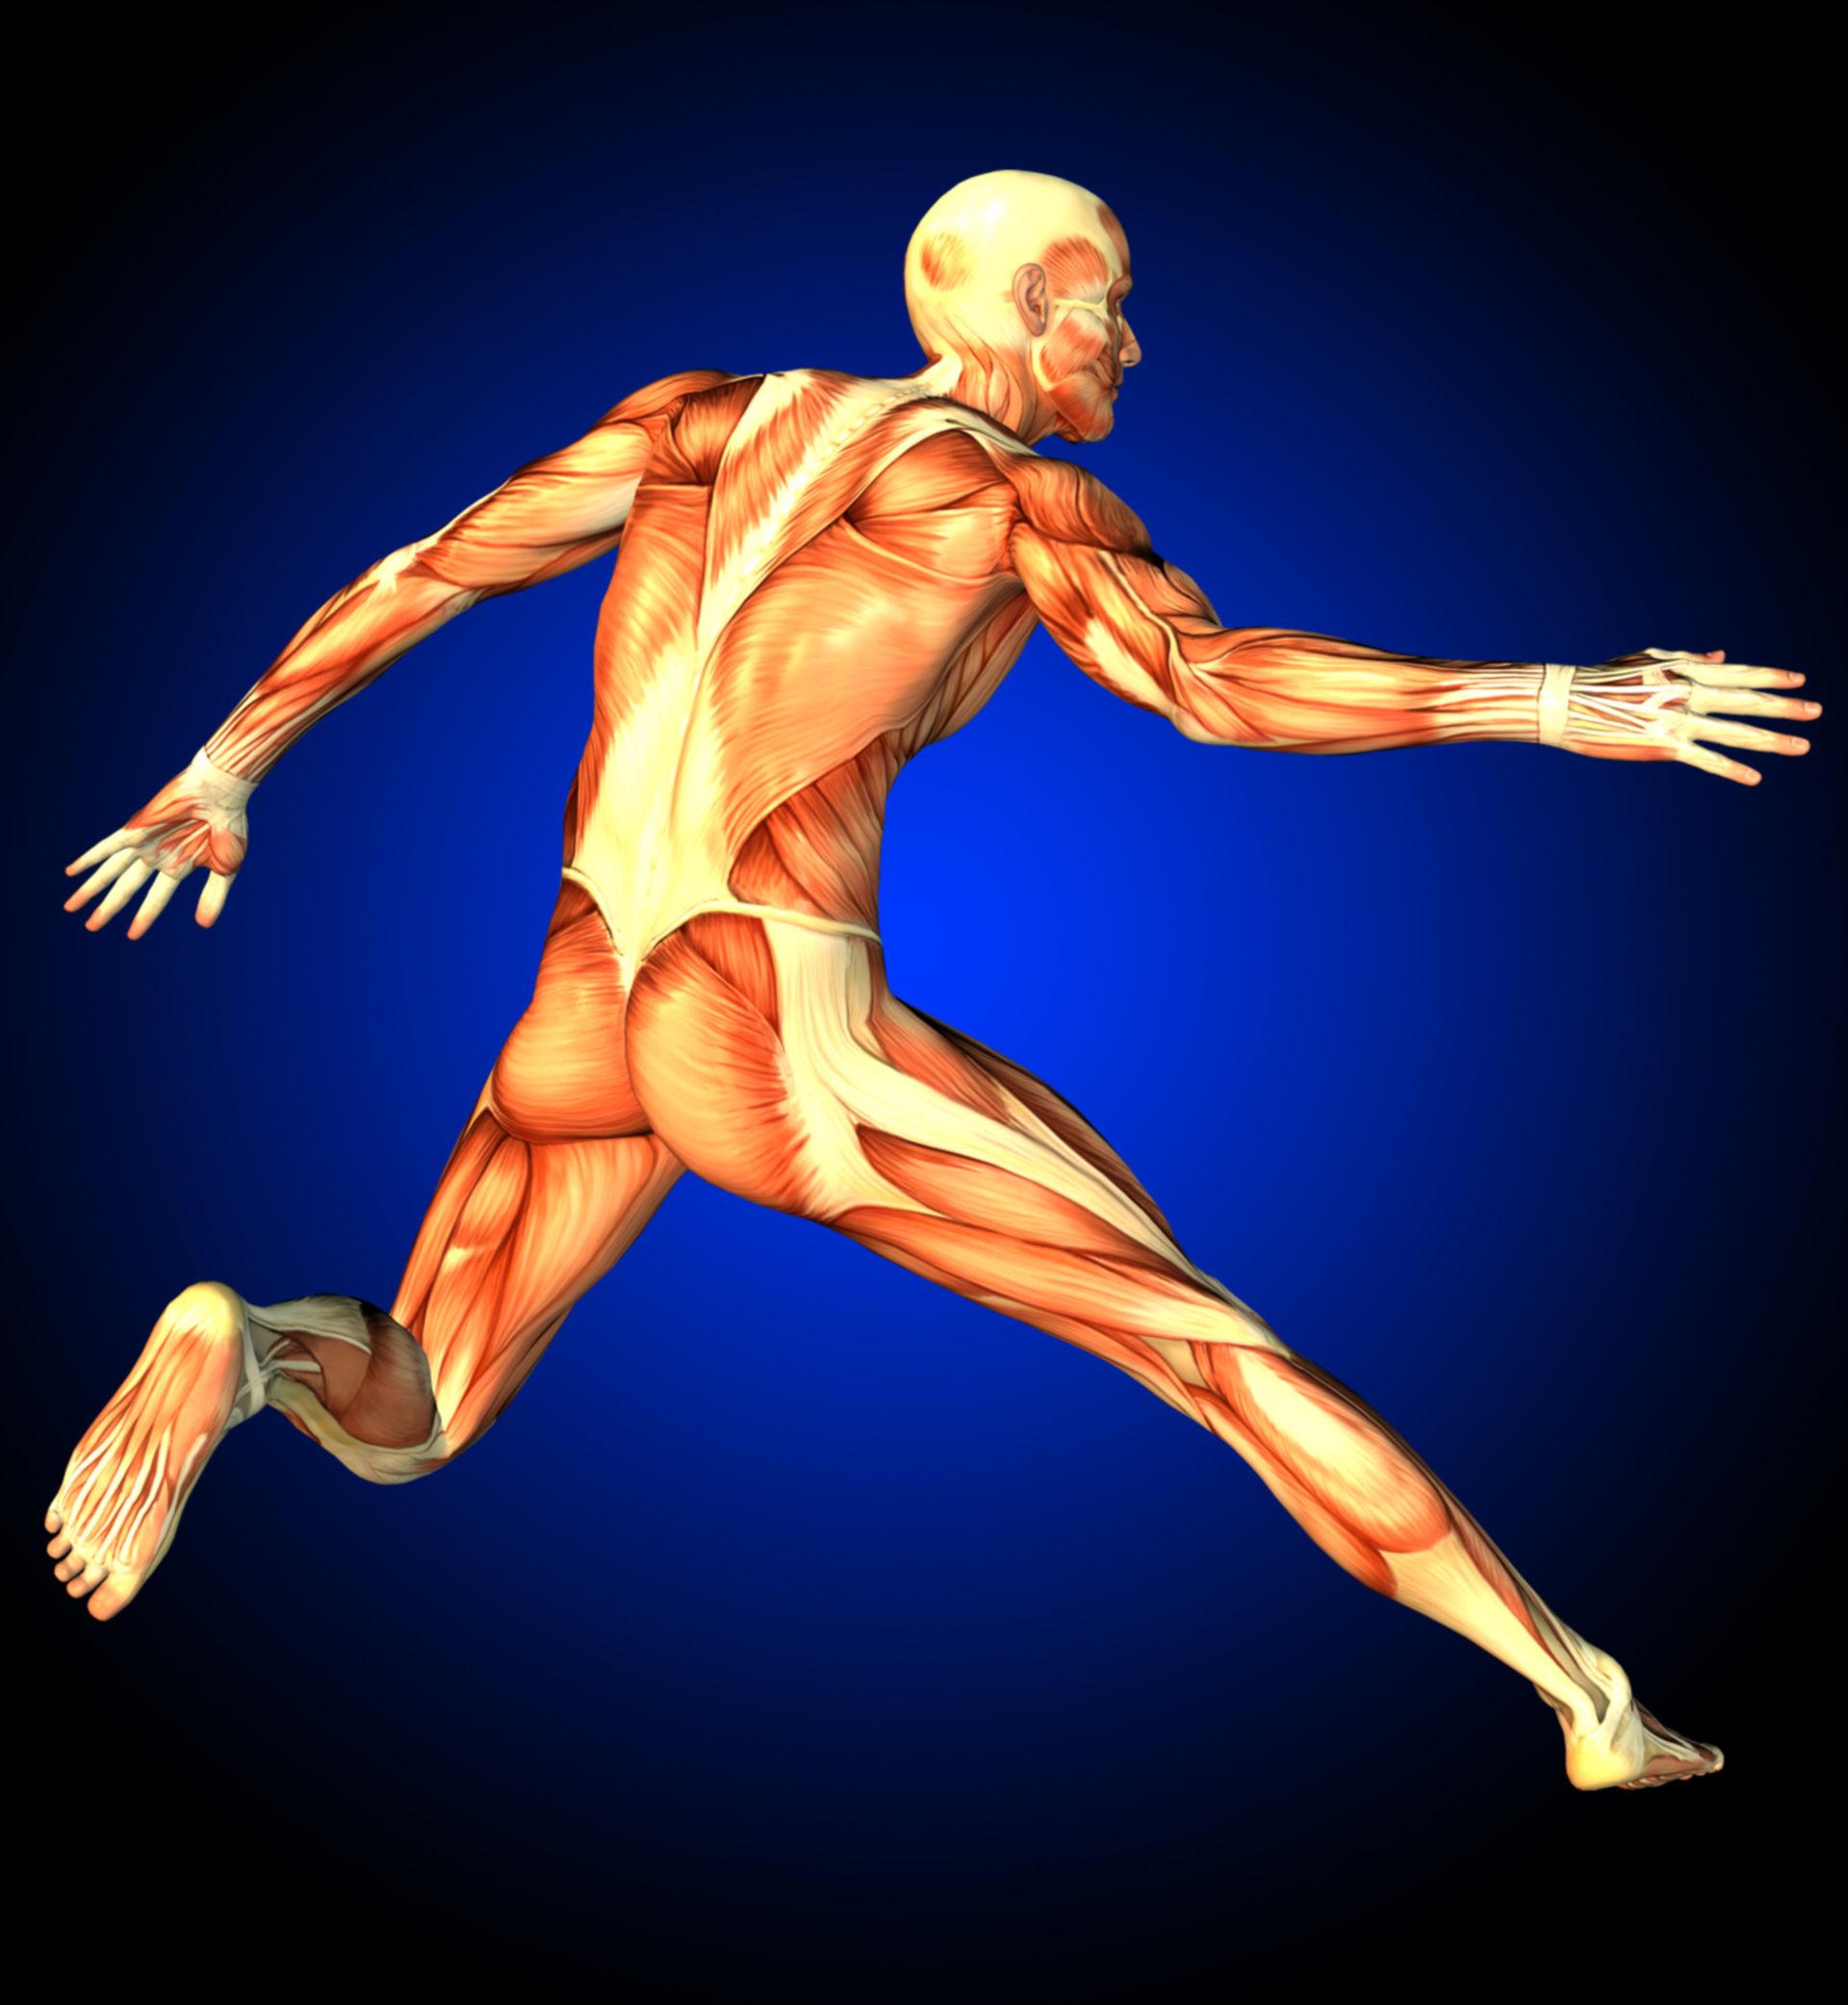 Muscolatura umana durante il salto